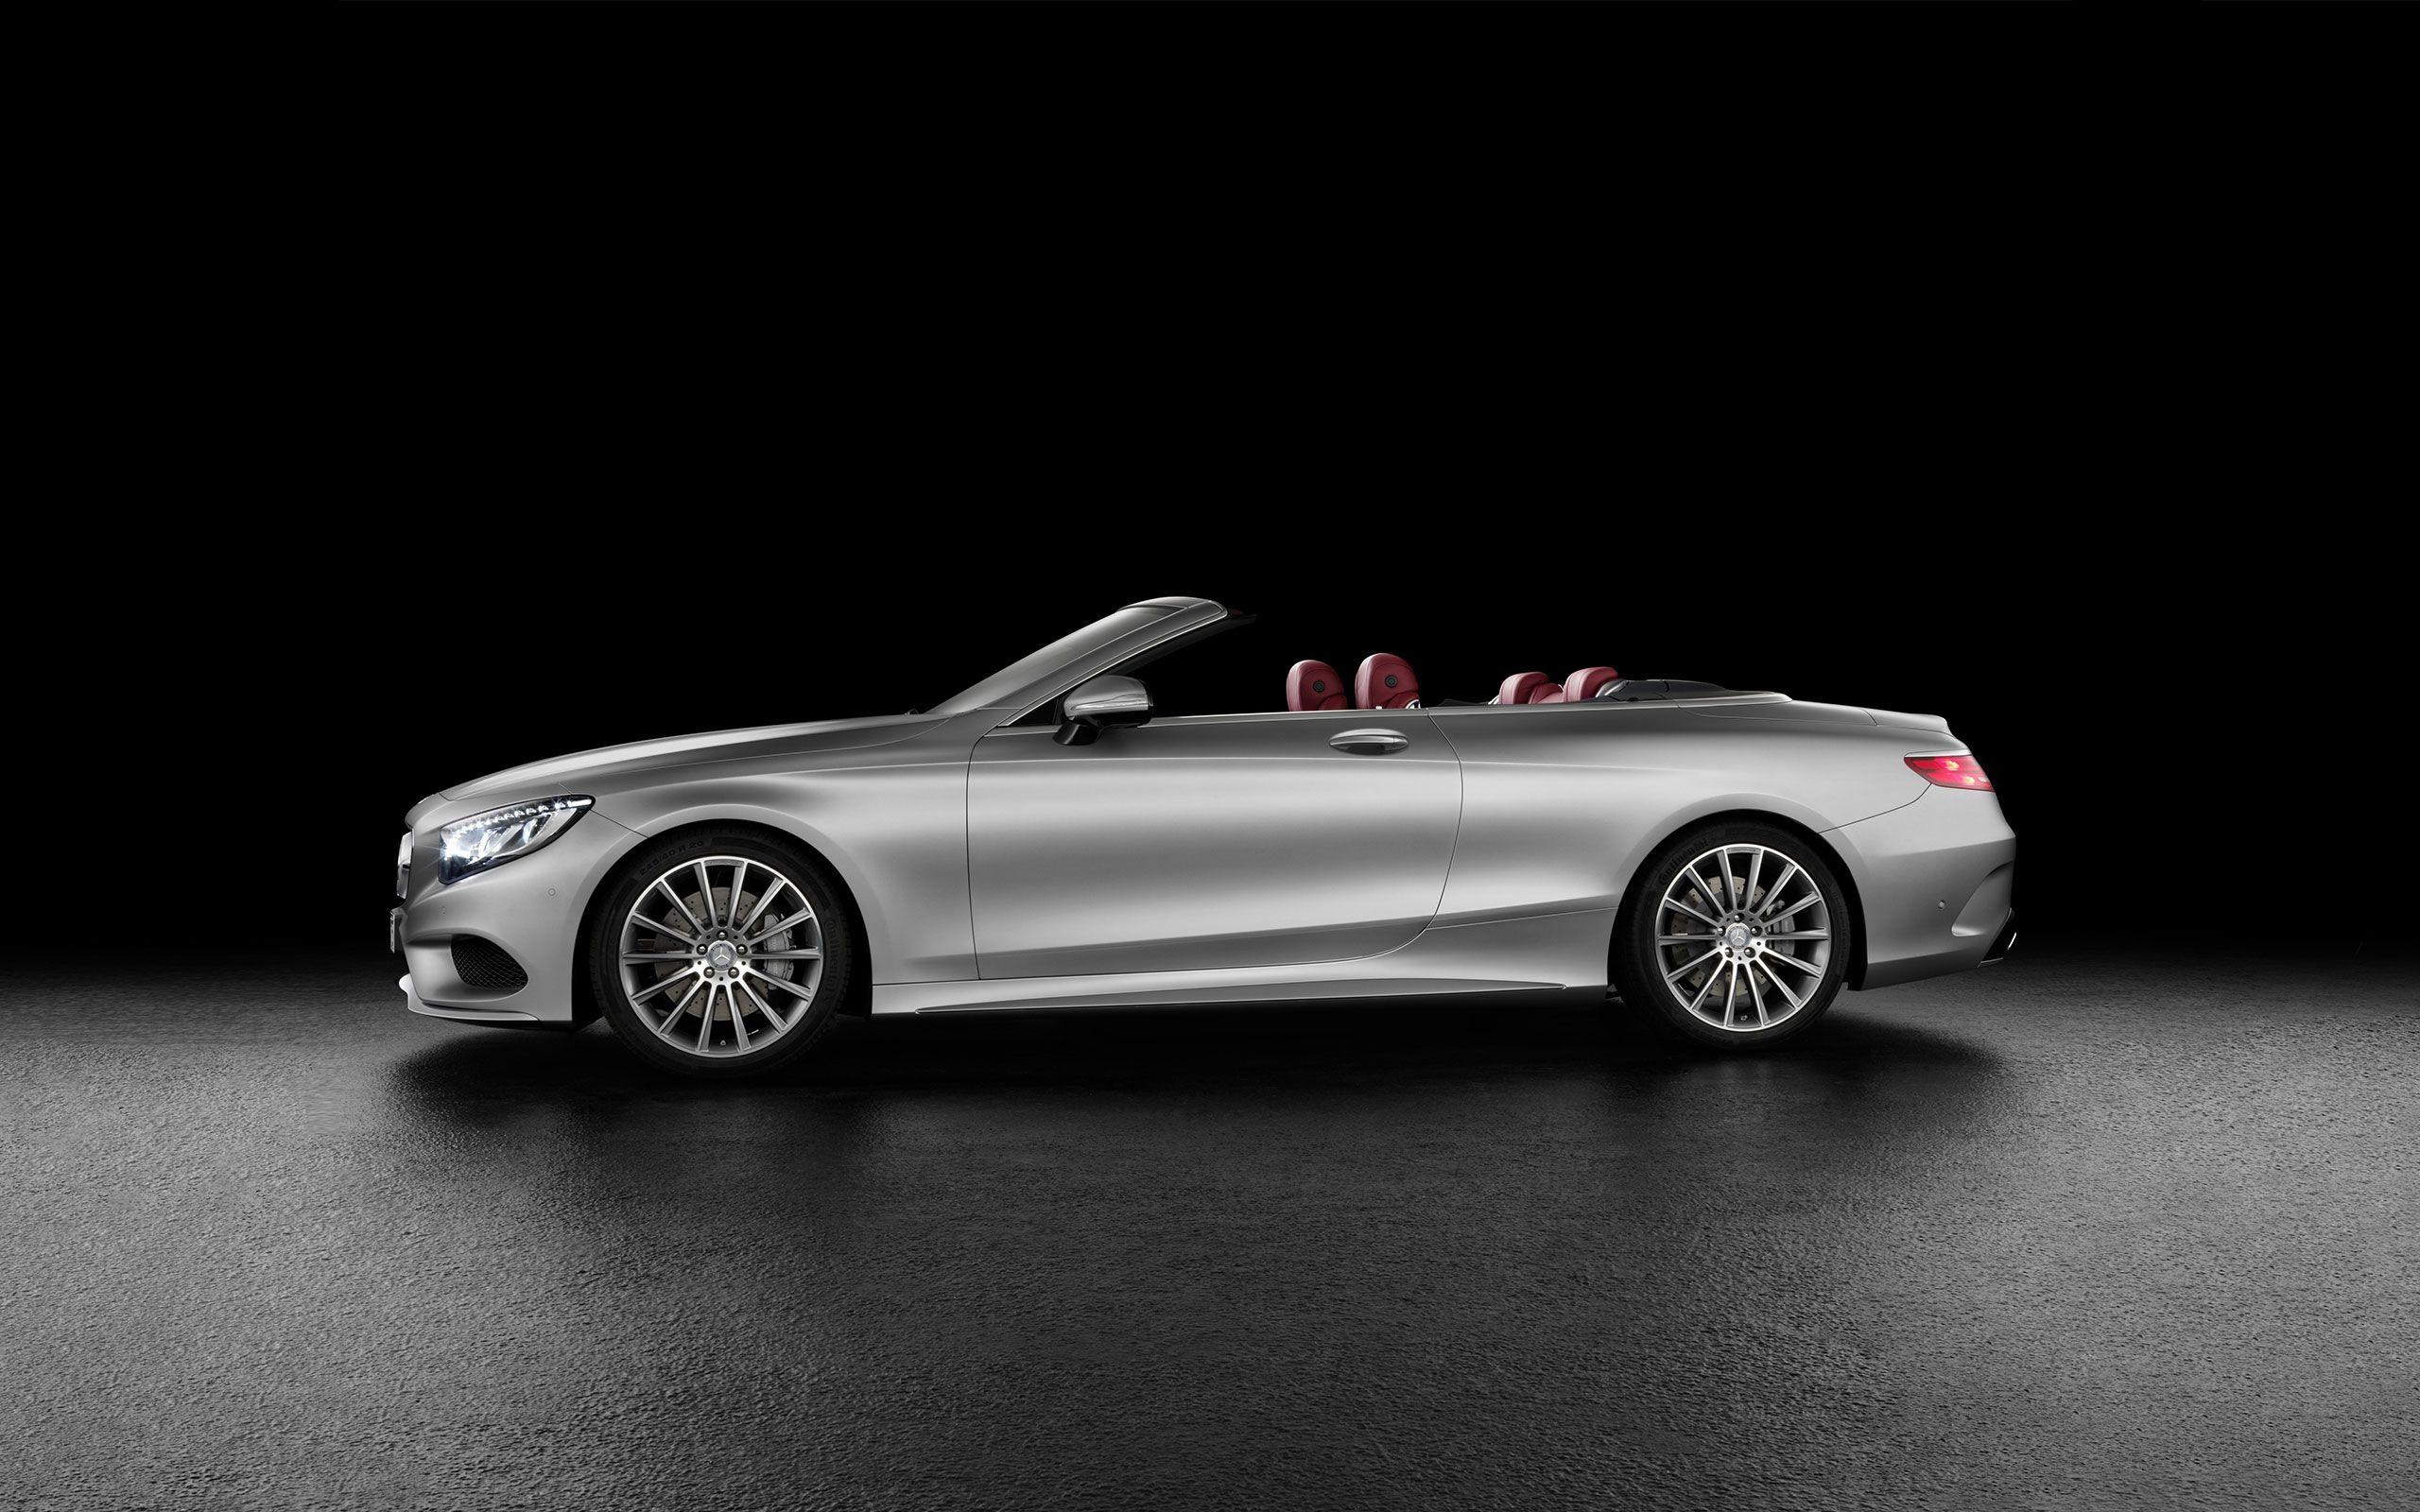 Mercedes Benz S Class Sedan Epitomizes Luxury Performance Design